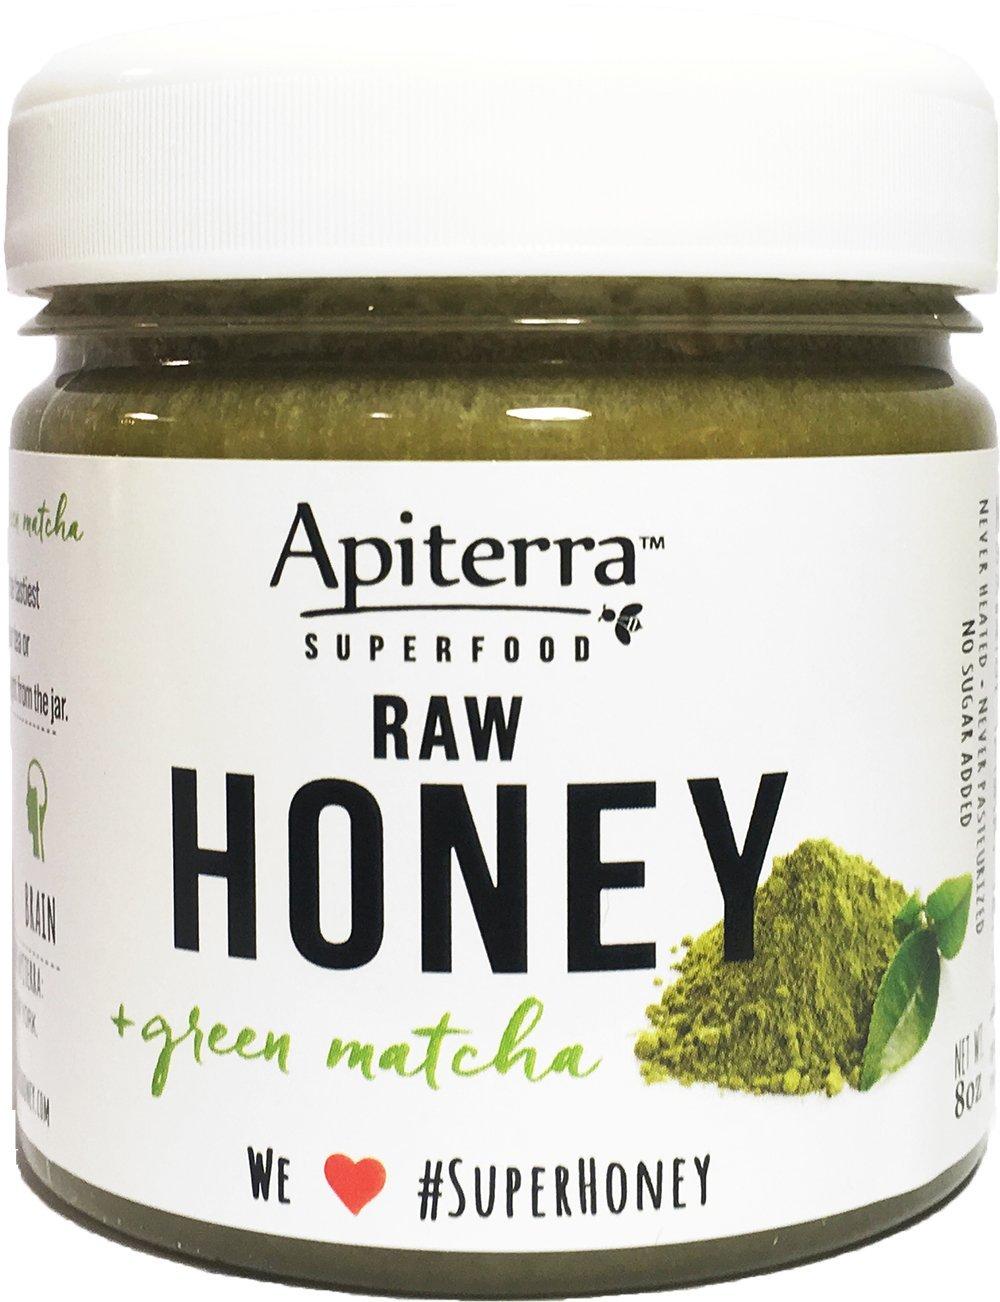 Apiterra Honey with Matcha Organic Green Tea Powder - 32 Ounce